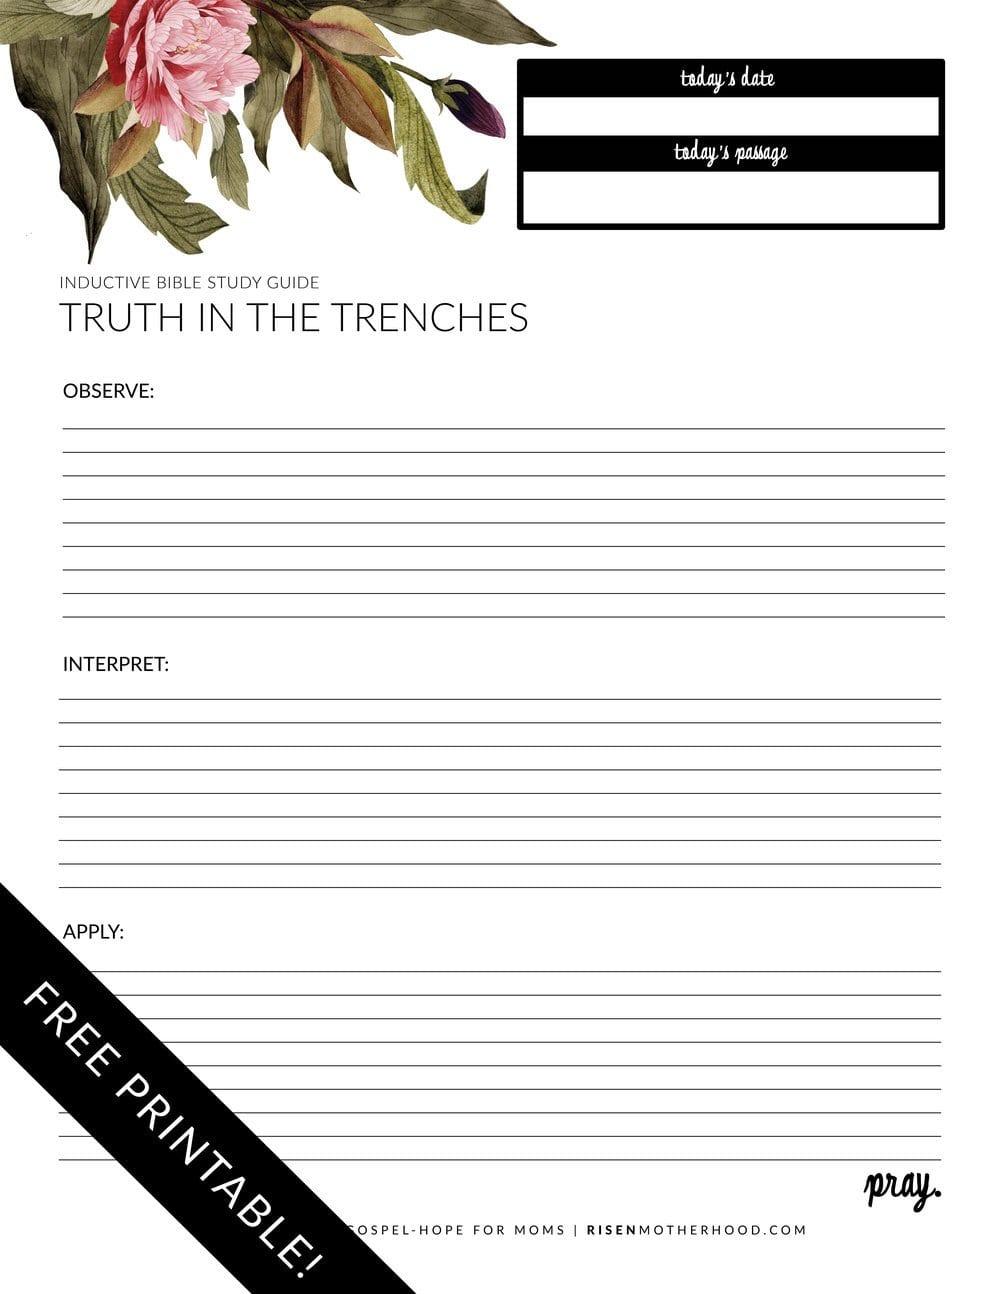 Free Printable Inductive Bible Study Worksheets  Companion Card With Bible Study Worksheets For Adults